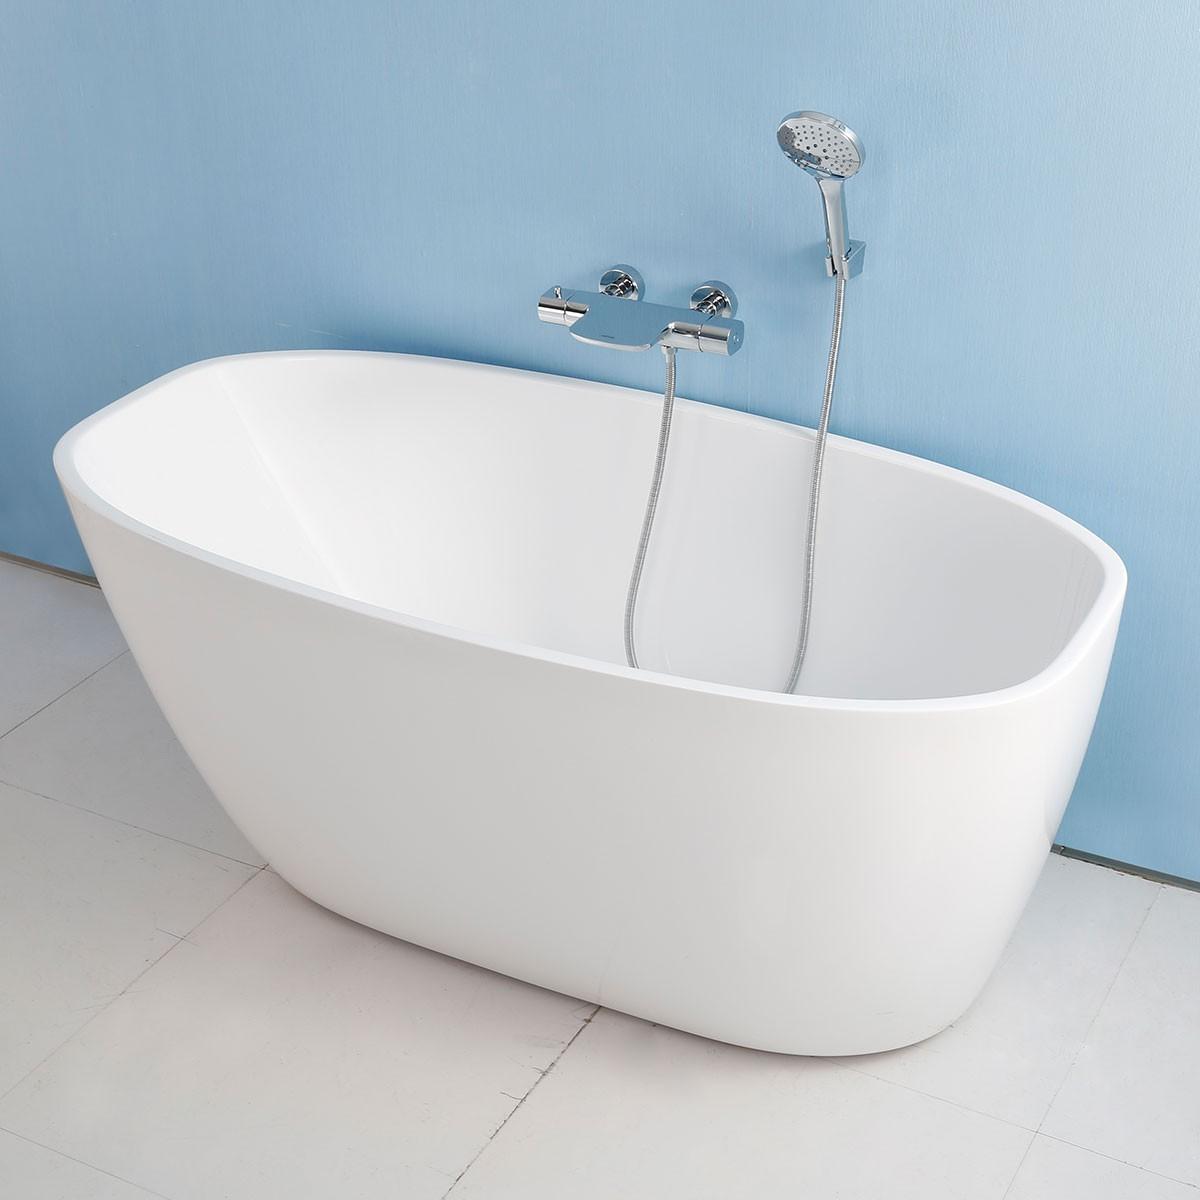 67 In White Acrylic Seamless Freestanding Bathtub (DK-AT-15776W)